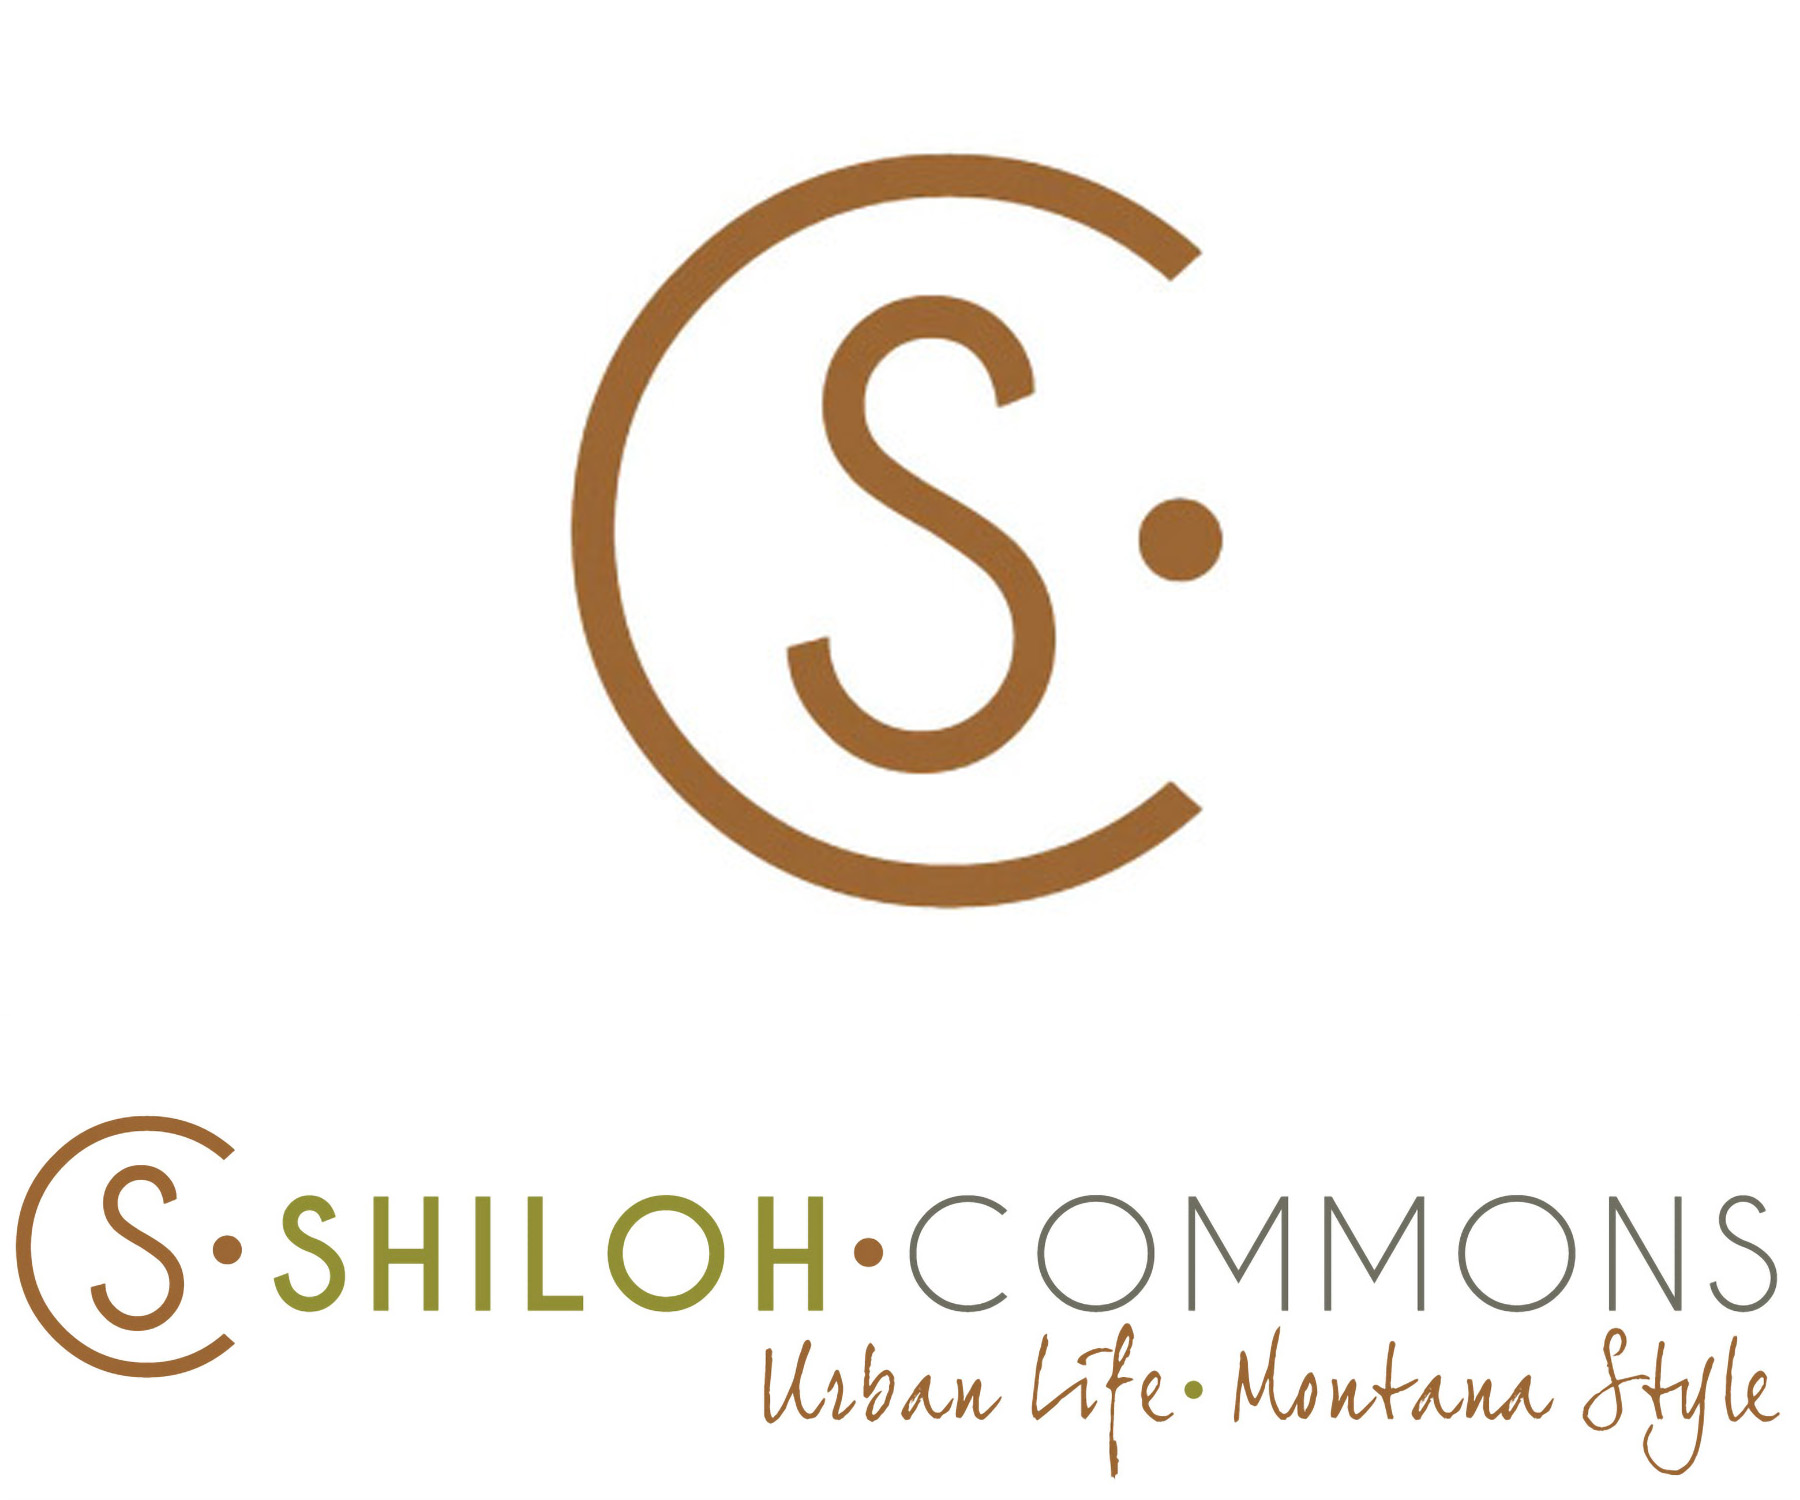 https://shilohcommonsmt.com/